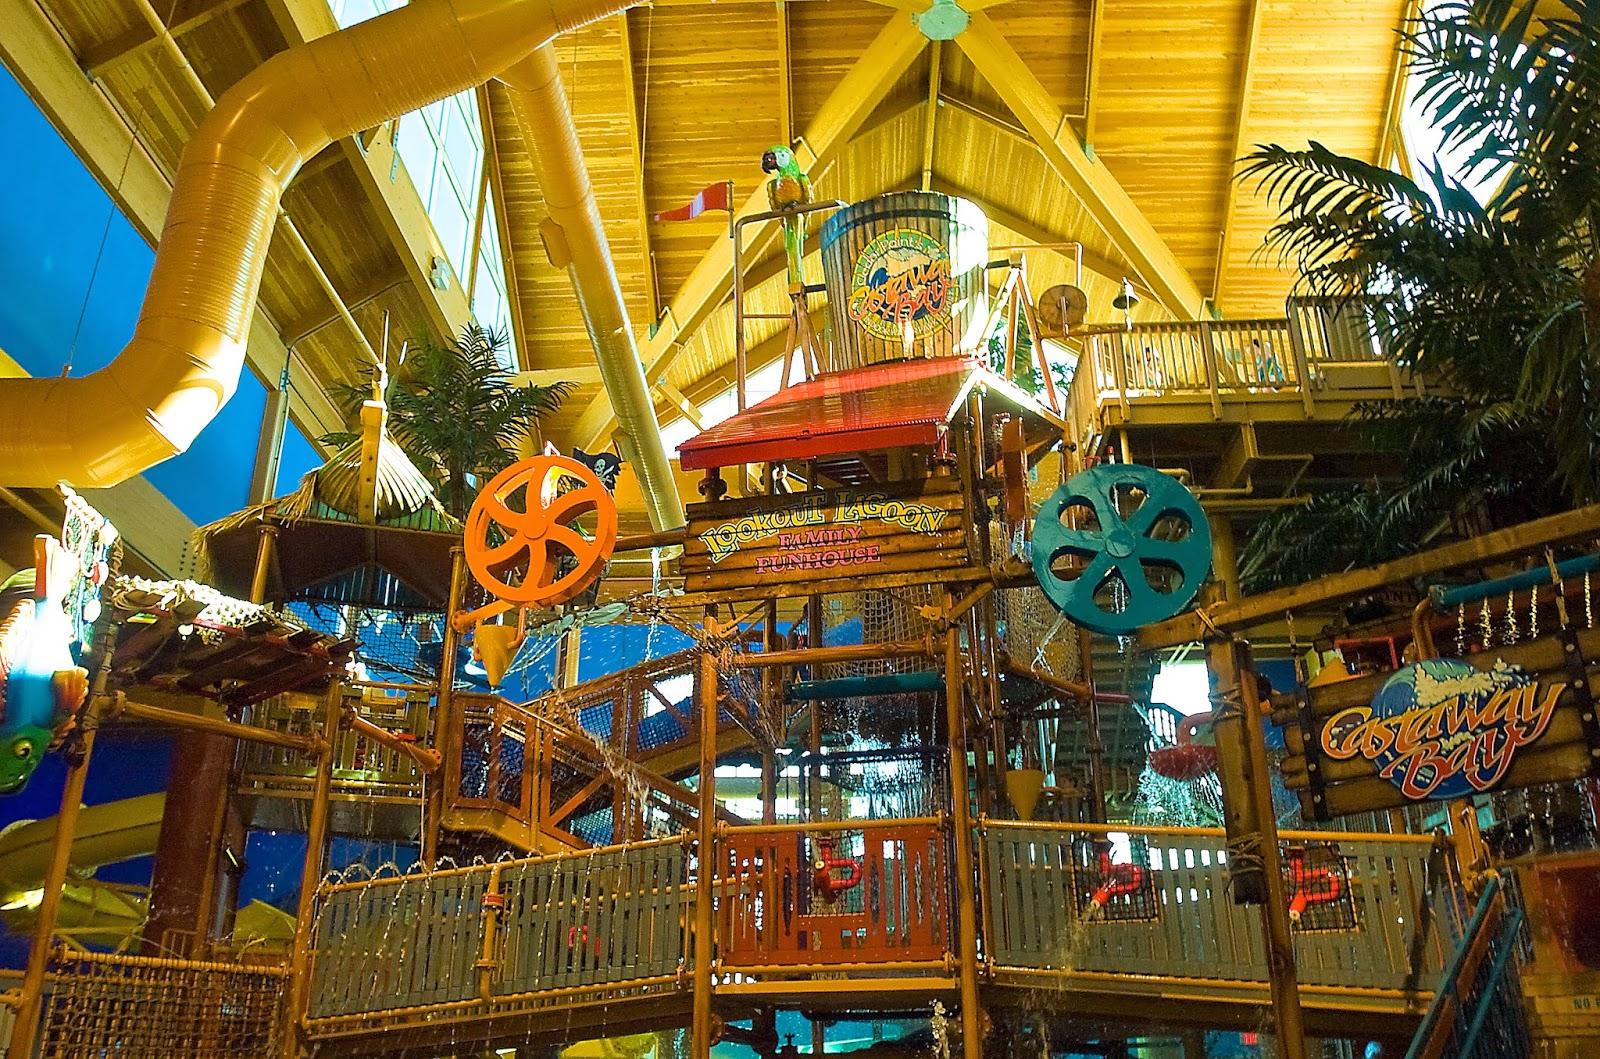 Castaway Bay Indoor Waterpark